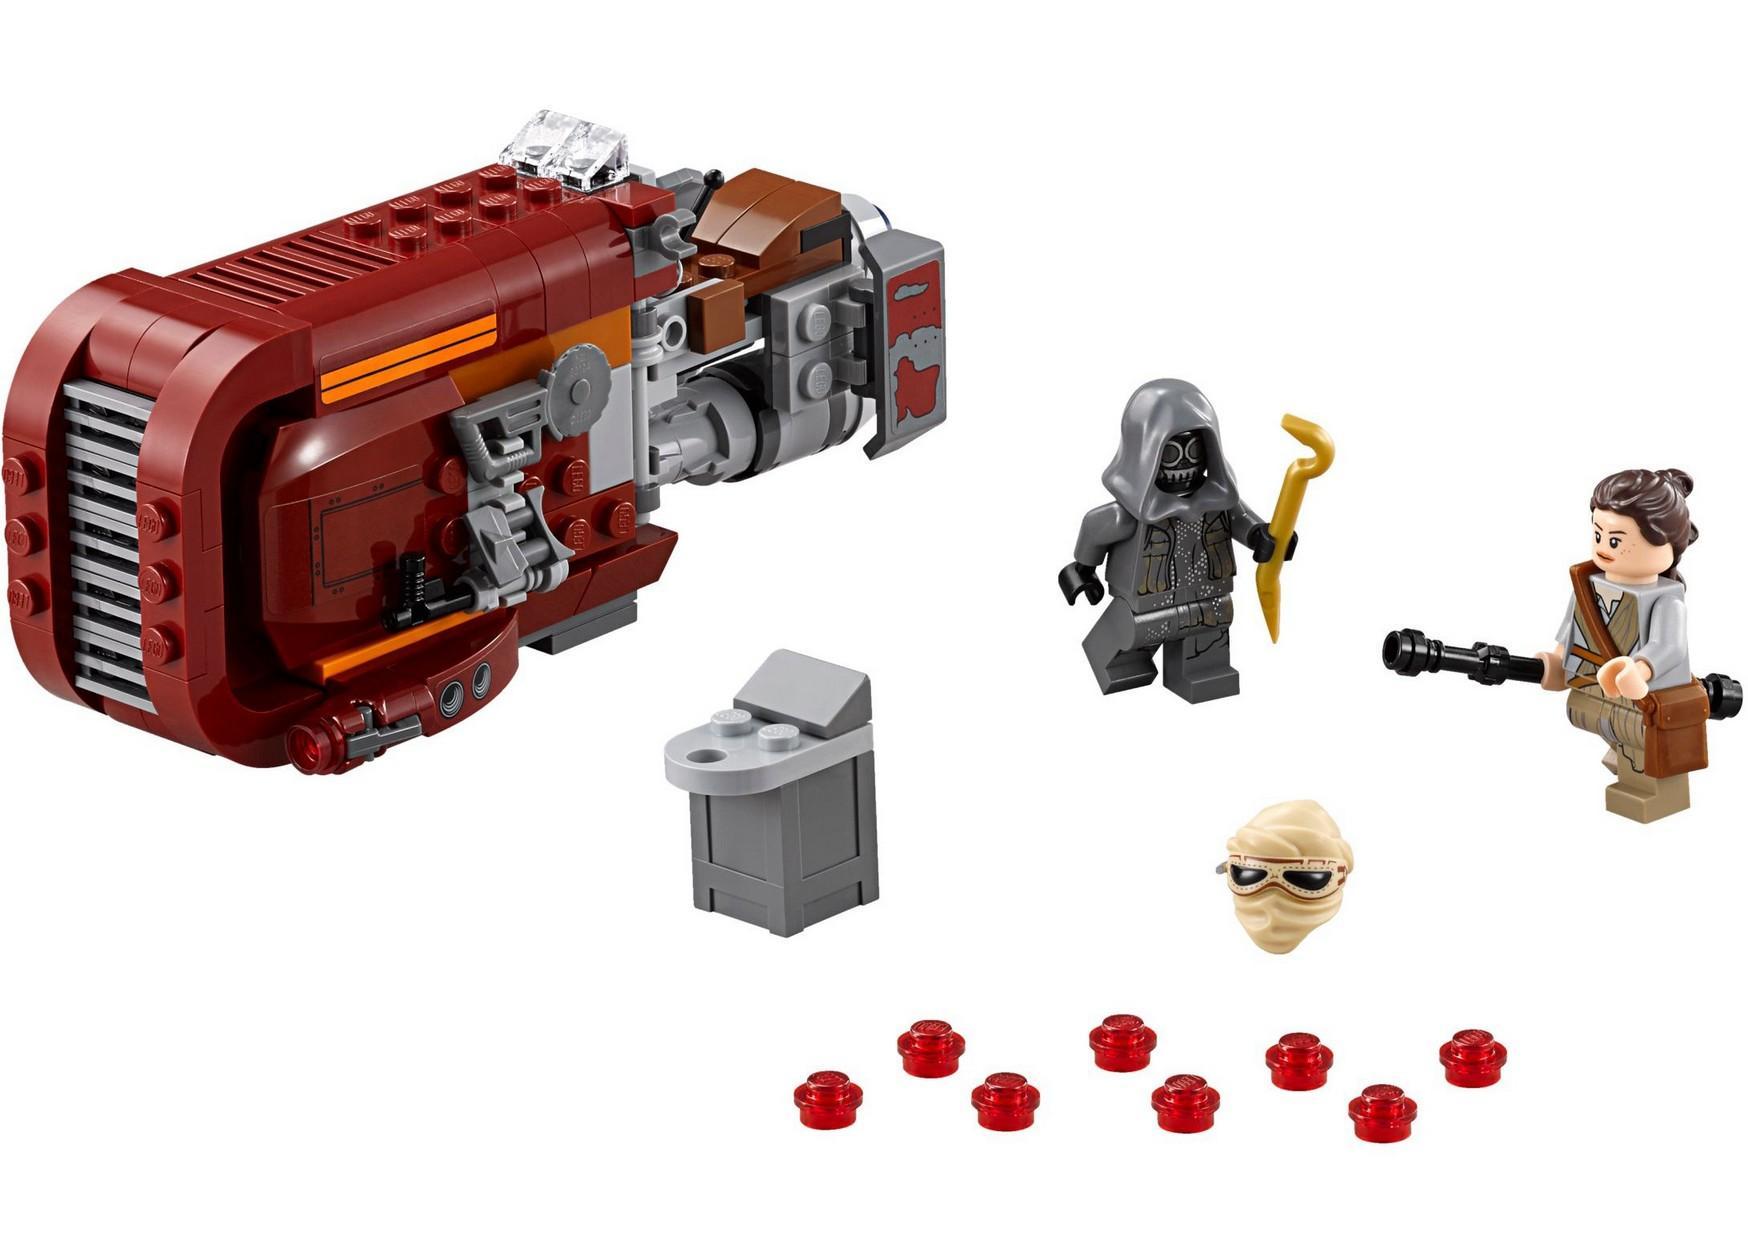 Serbaguna Elastis Tanpa Sambungan Seamless Motif Abstrak . Source · Daftar Harga BUFF . Source · Detail Gambar LEGO Star Wars 75099 Rey's Speeder Terbaru